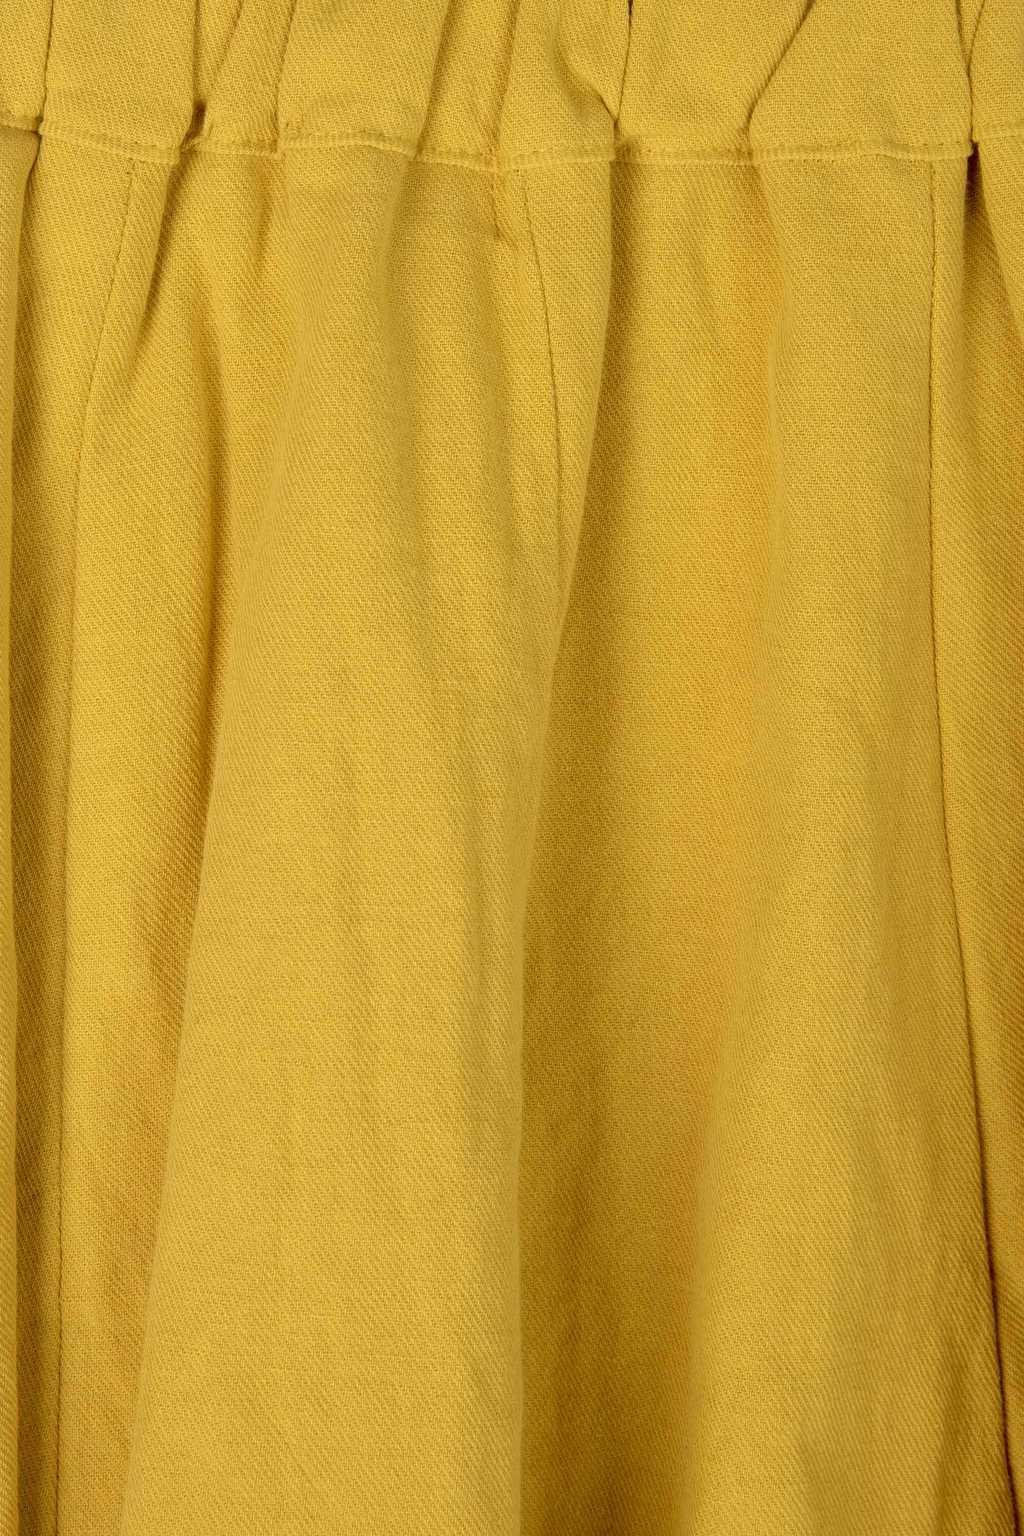 Skirt K022 Mustard 6